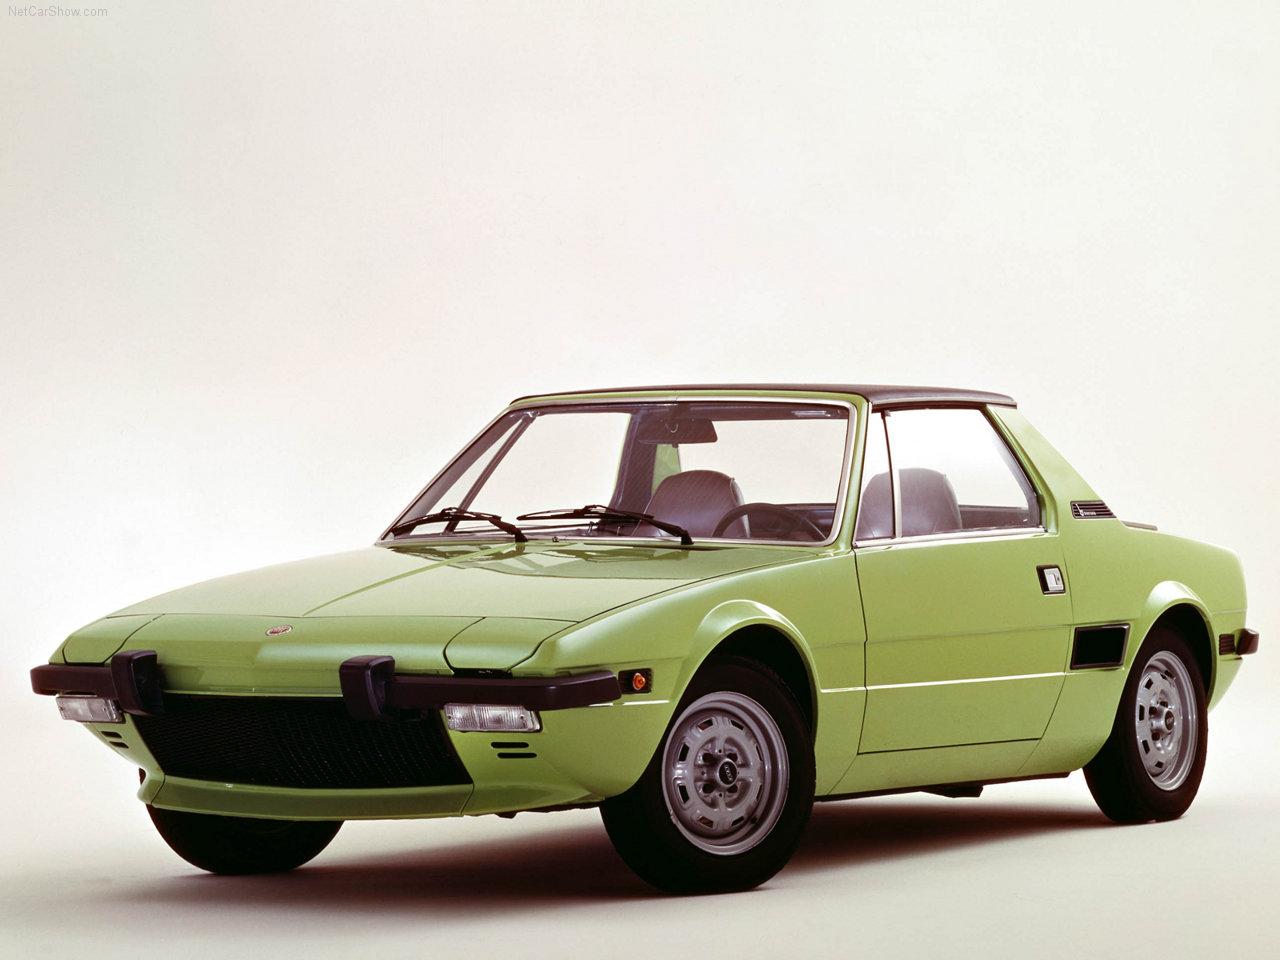 Fiat, Bertone, Fiat X1/9, Bertone X1/9, Fiat X1/9 buying guide, Classic Fiat